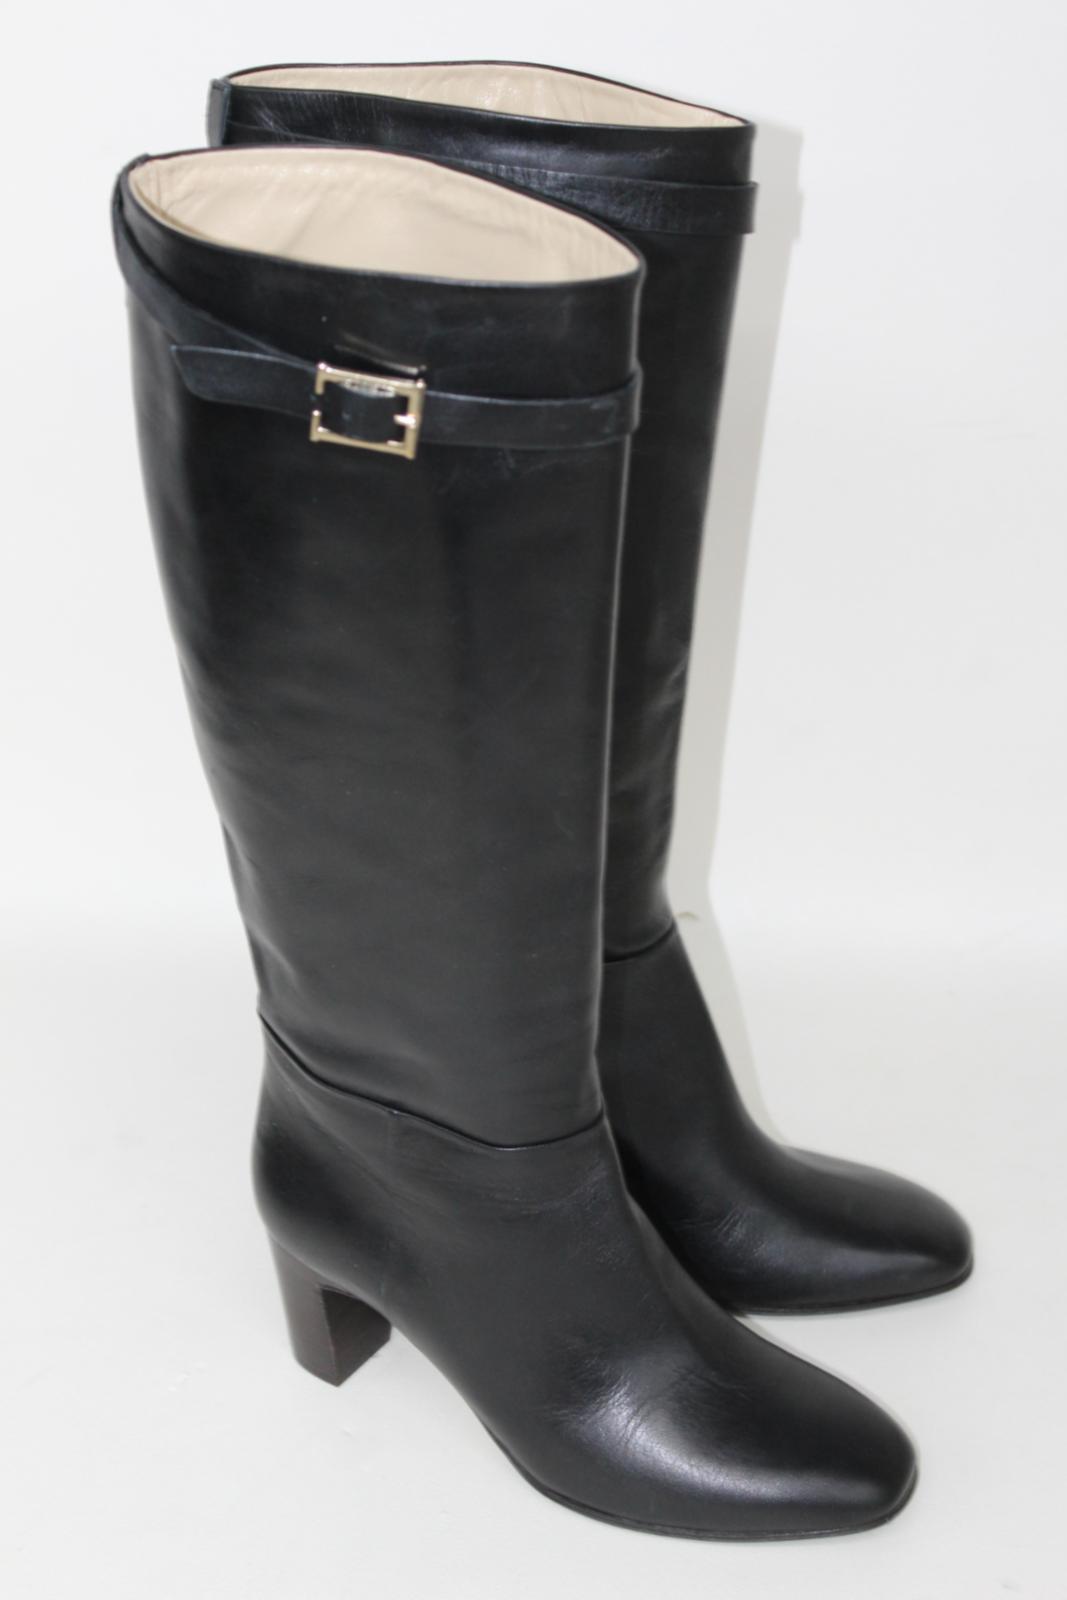 Hobbs-Senoras-Rodilla-Tacon-Maya-Cuero-Negro-Botas-De-Montar-UK8-EU41-Nuevo miniatura 4